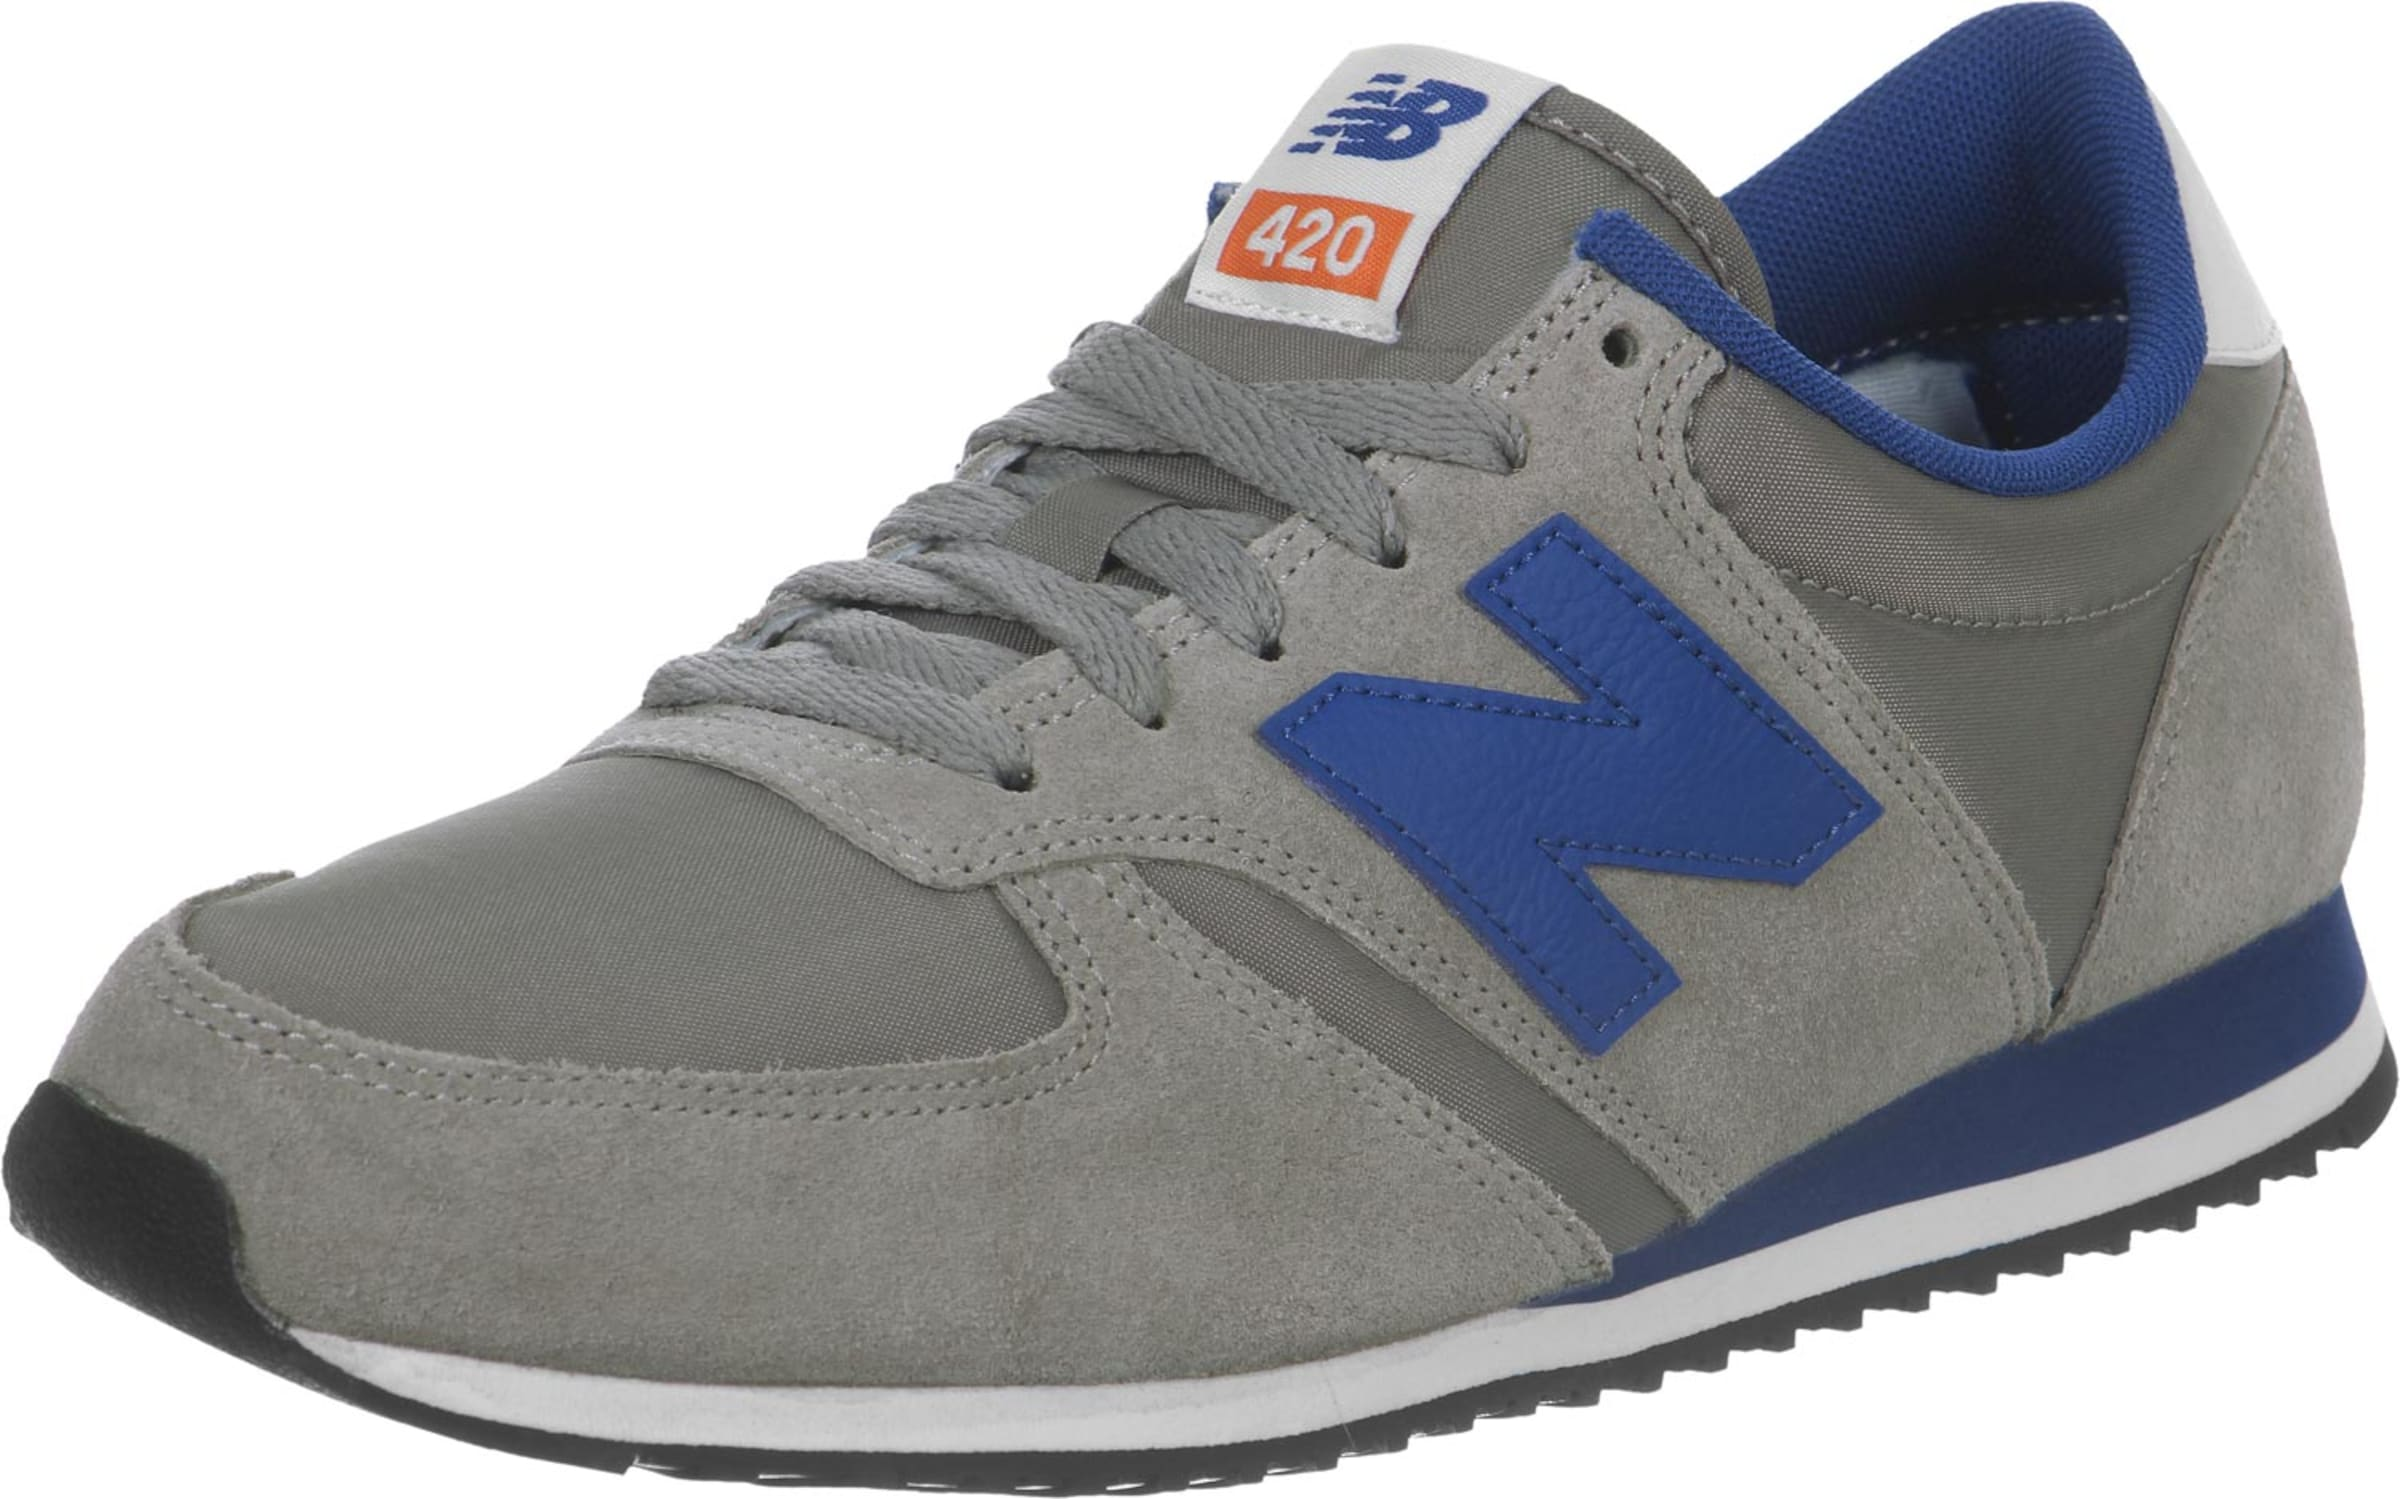 New DunkelblauGrau In Balance Sneaker 'u420' jL5c34ARq